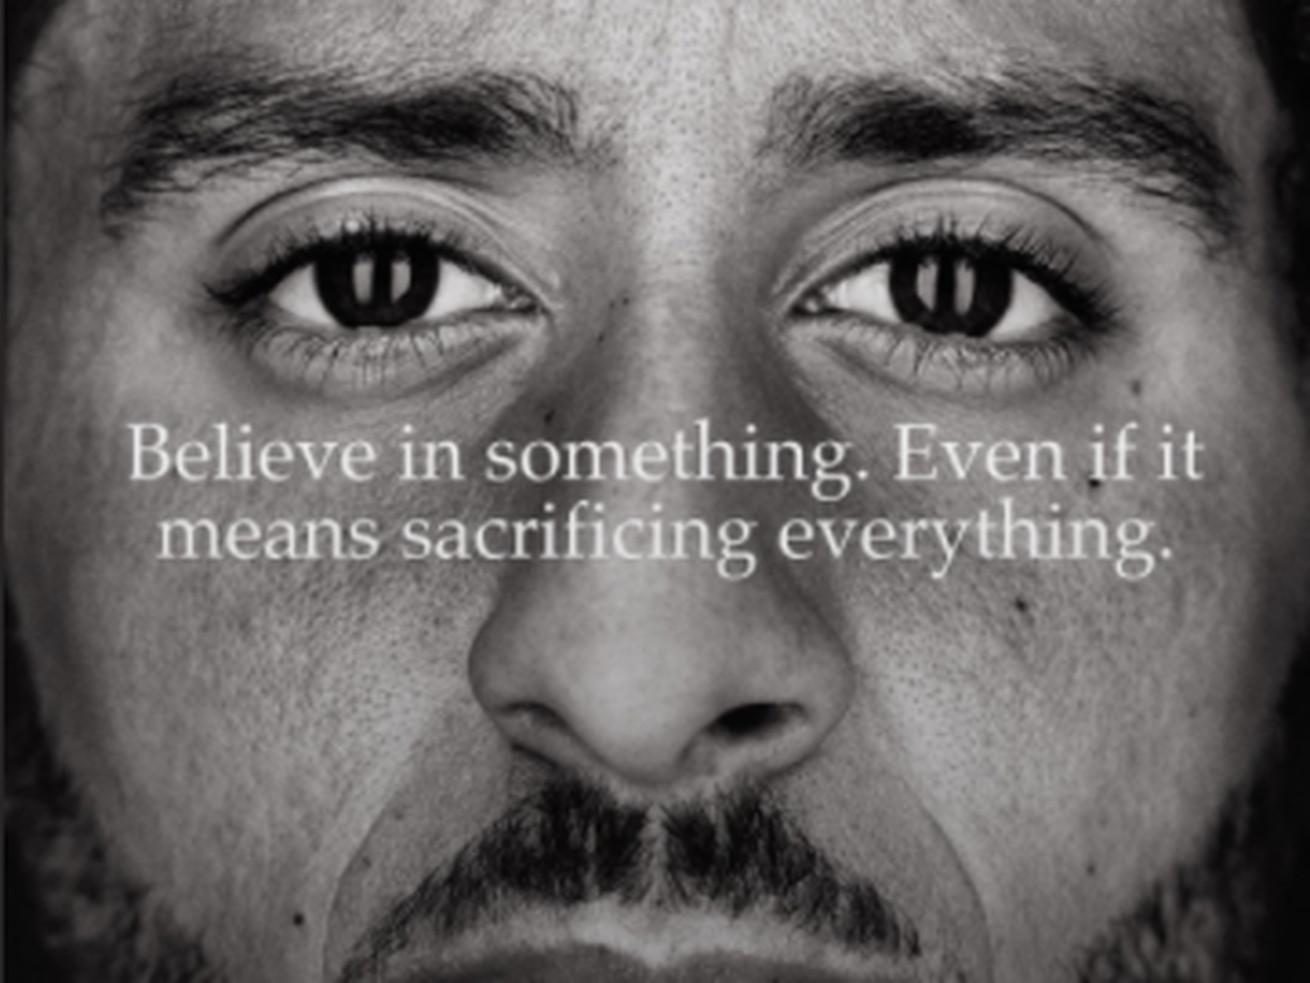 Kaepernick's Nike ad.